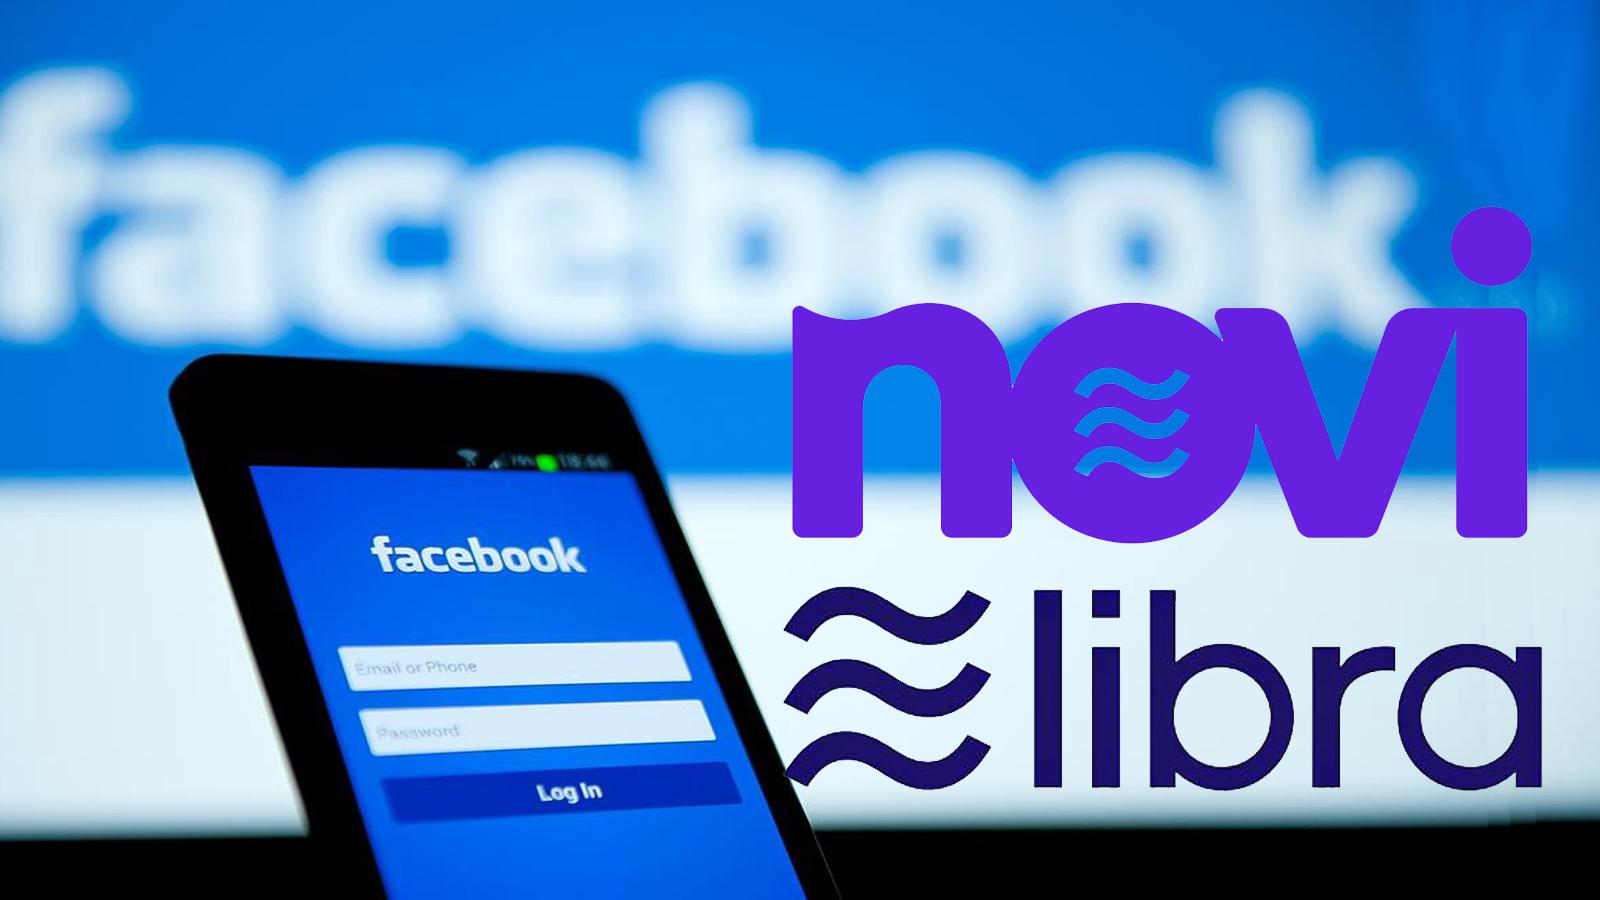 Calibra Rebrands As Novi to Avoid Confusion With Libra